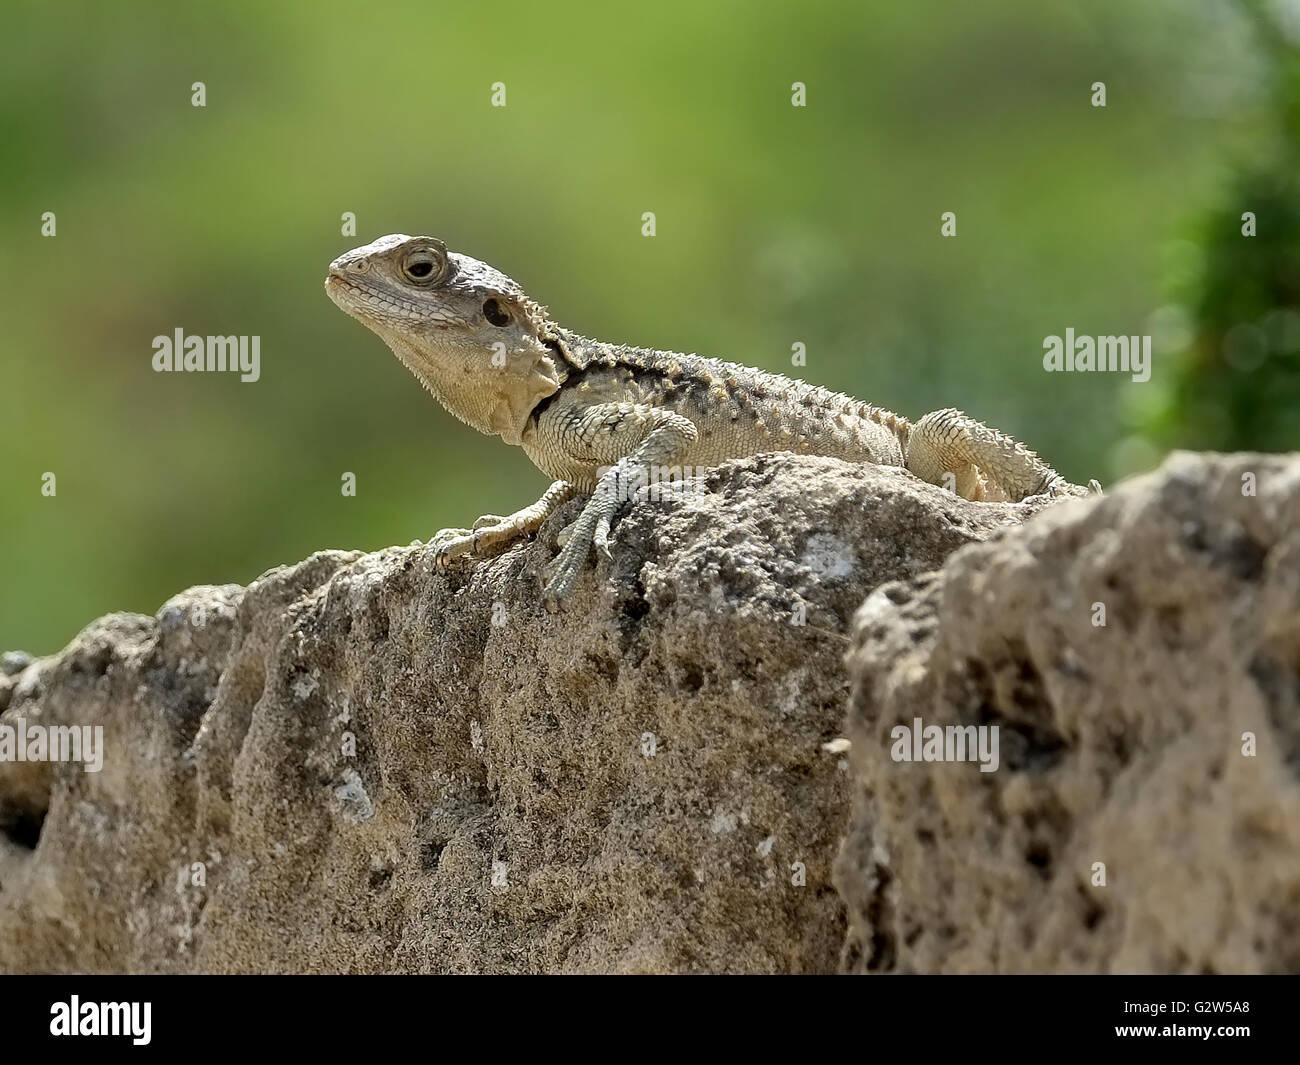 Gecko Lizard (infraorder Gekkota) on a rock,  Salamis, Famagusta, (Gazimagusa),  Northern Cyprus. Stock Photo